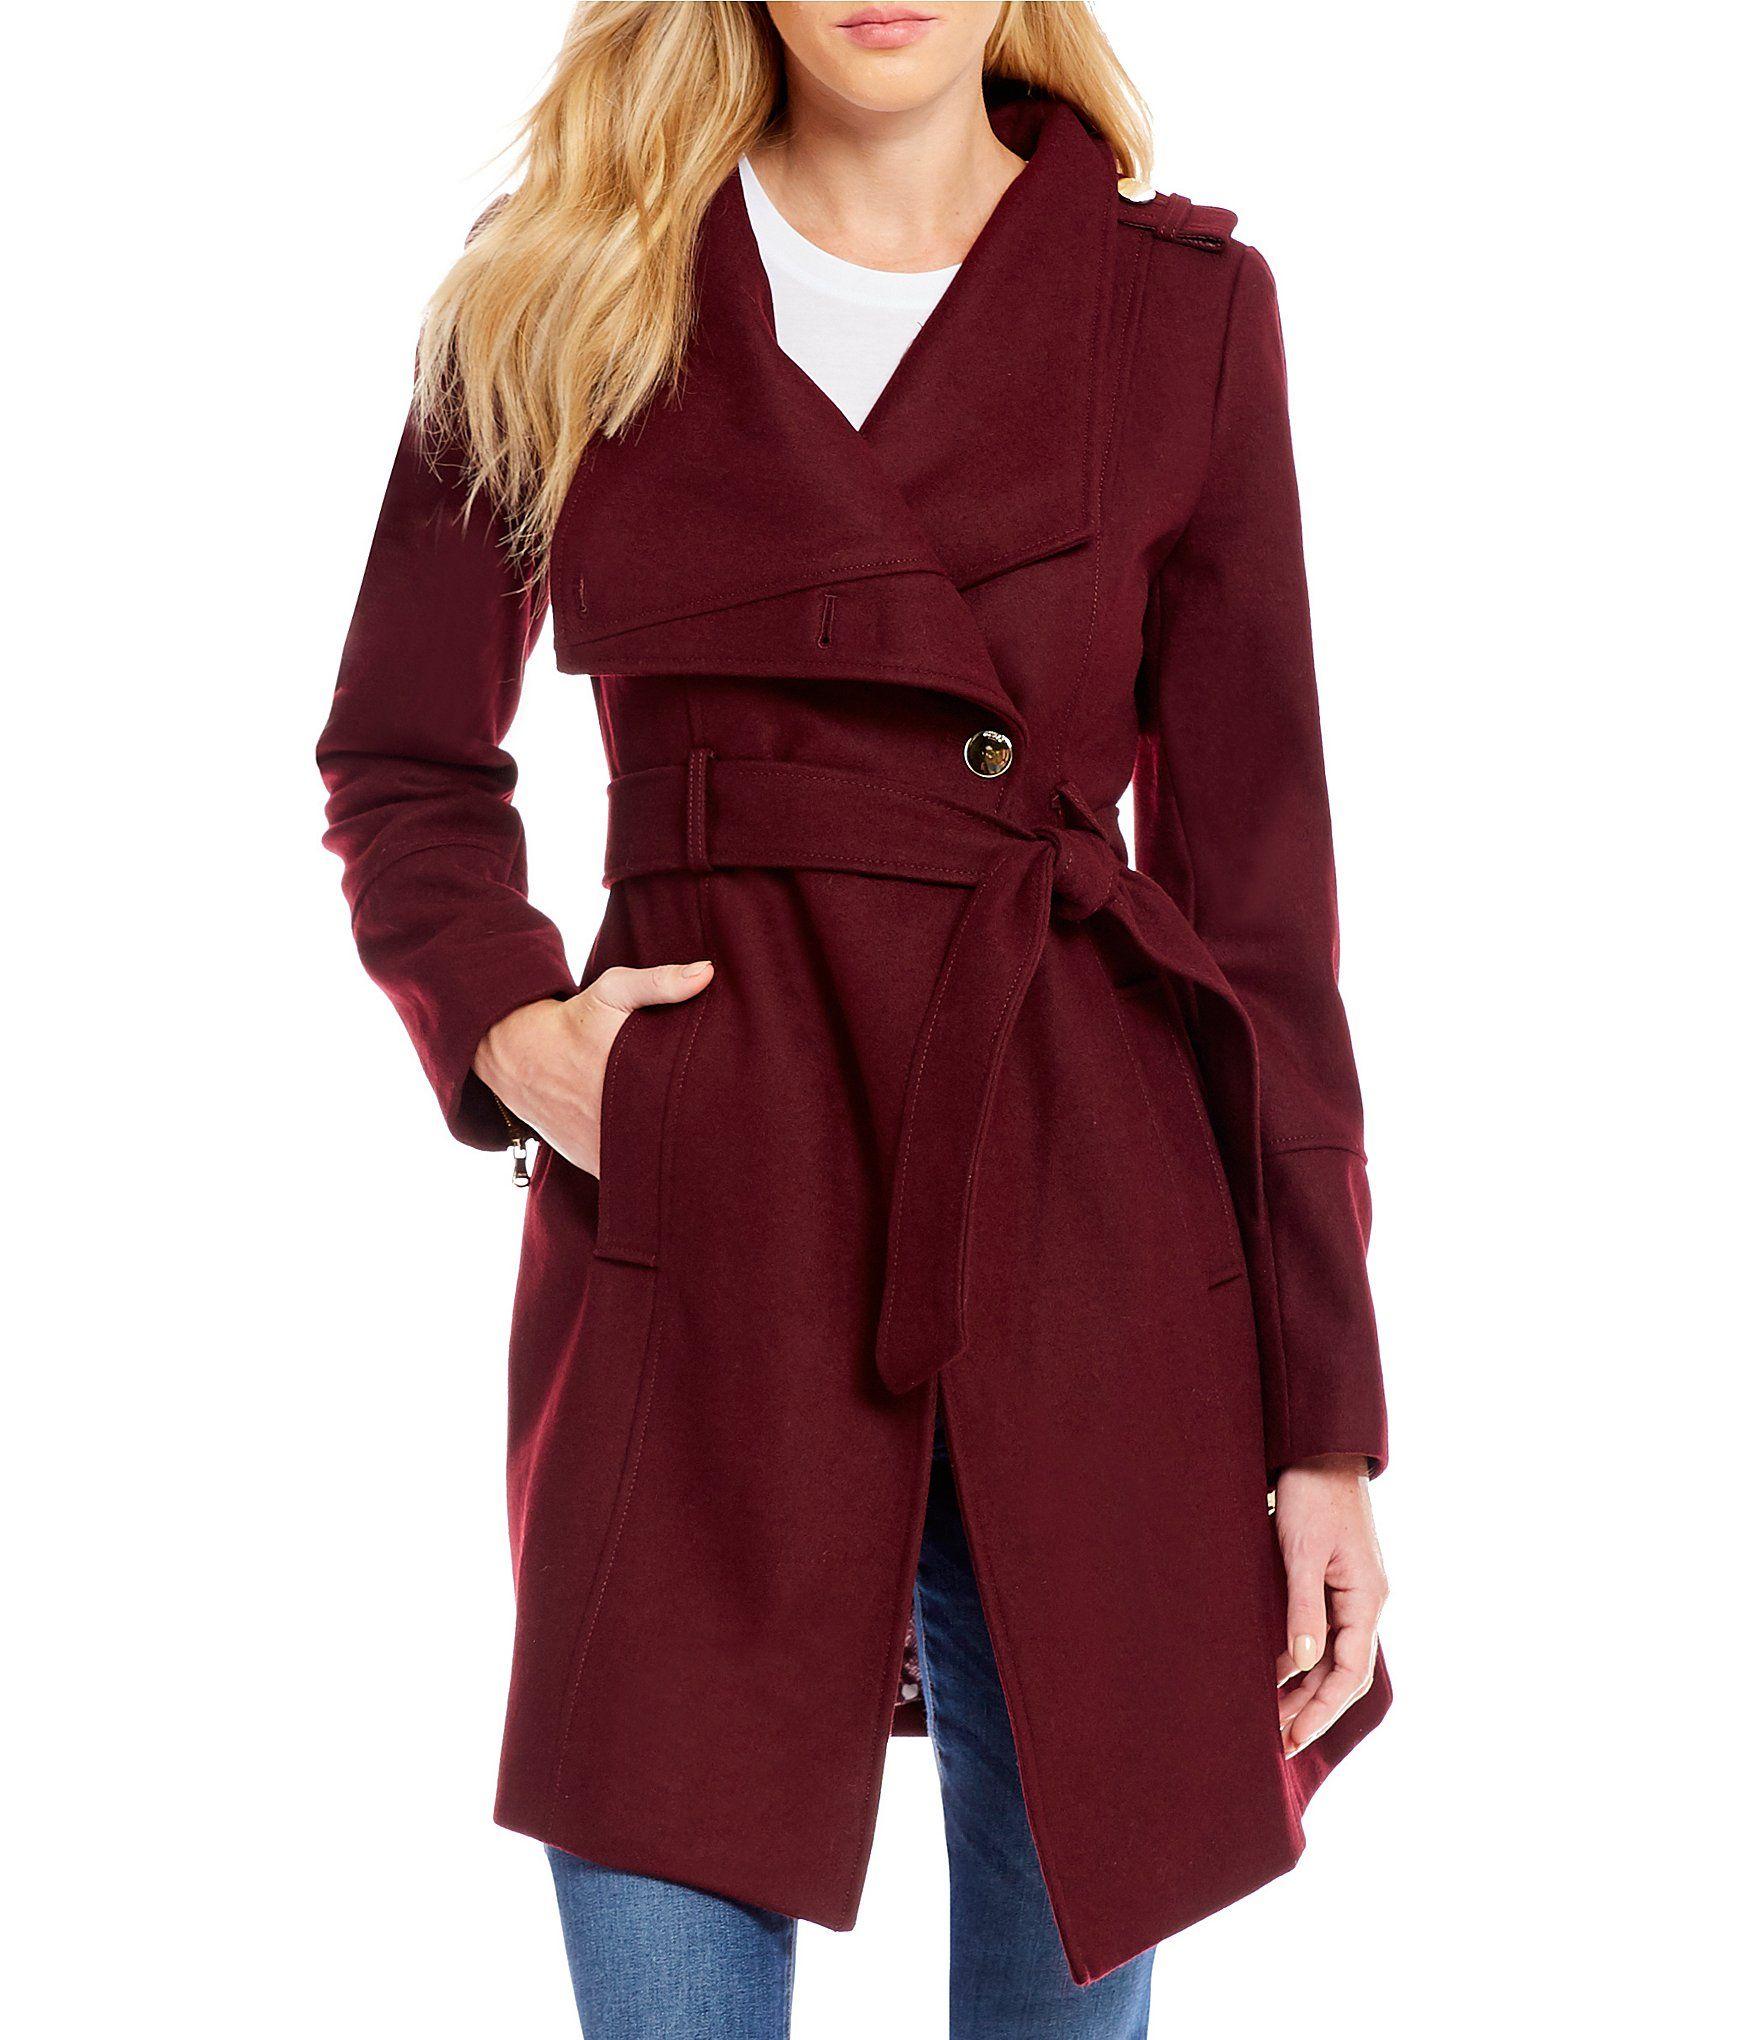 Pin By Yvonne Shelton On My Style Belted Wrap Coat Wrap Coat Coats For Women [ 2040 x 1760 Pixel ]